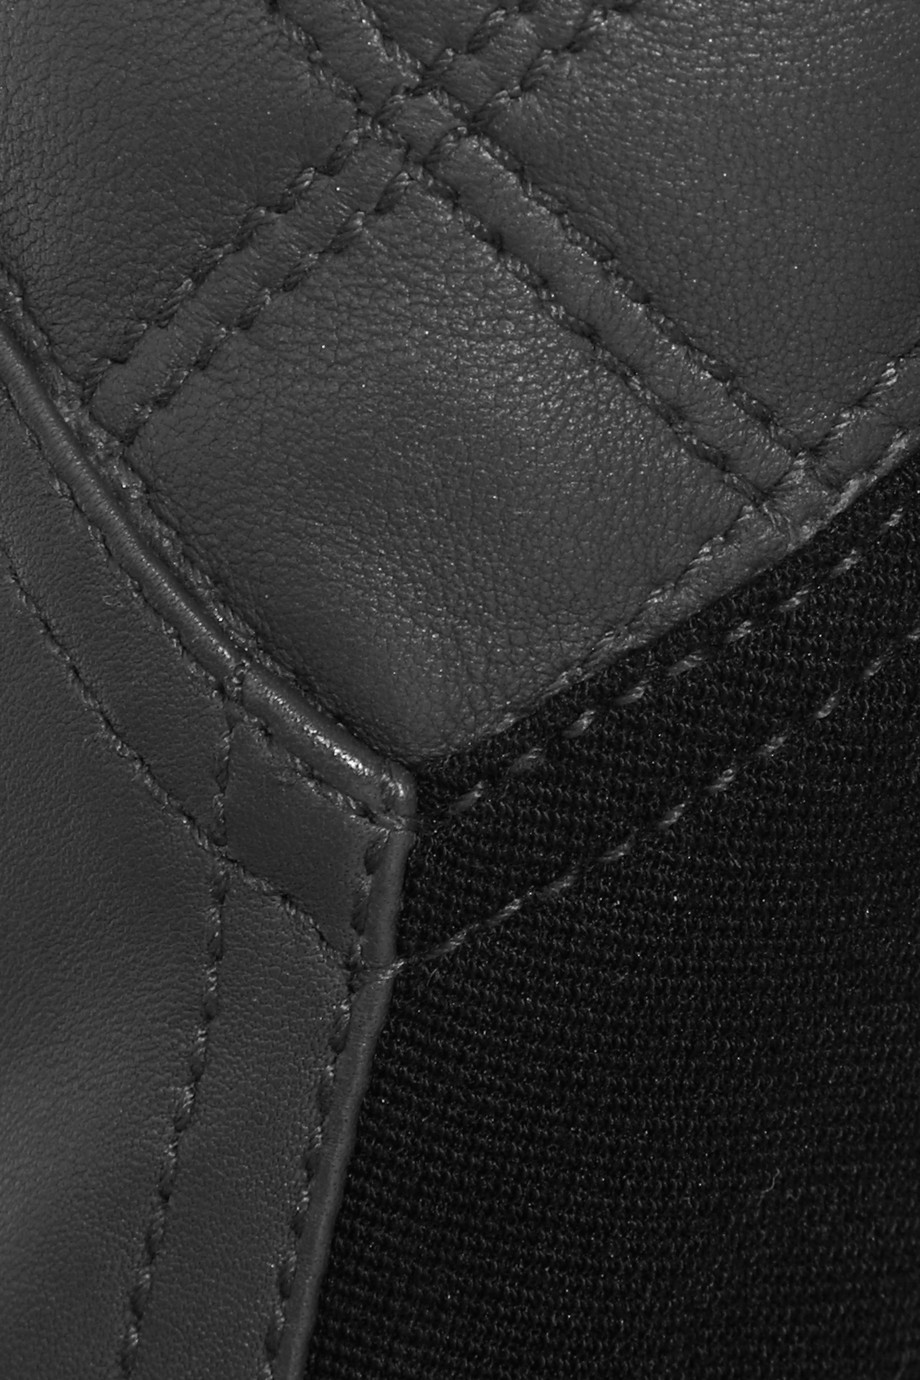 Matthew Williamson Paneled Skinny Leather Pants in Charcoal (Grey)